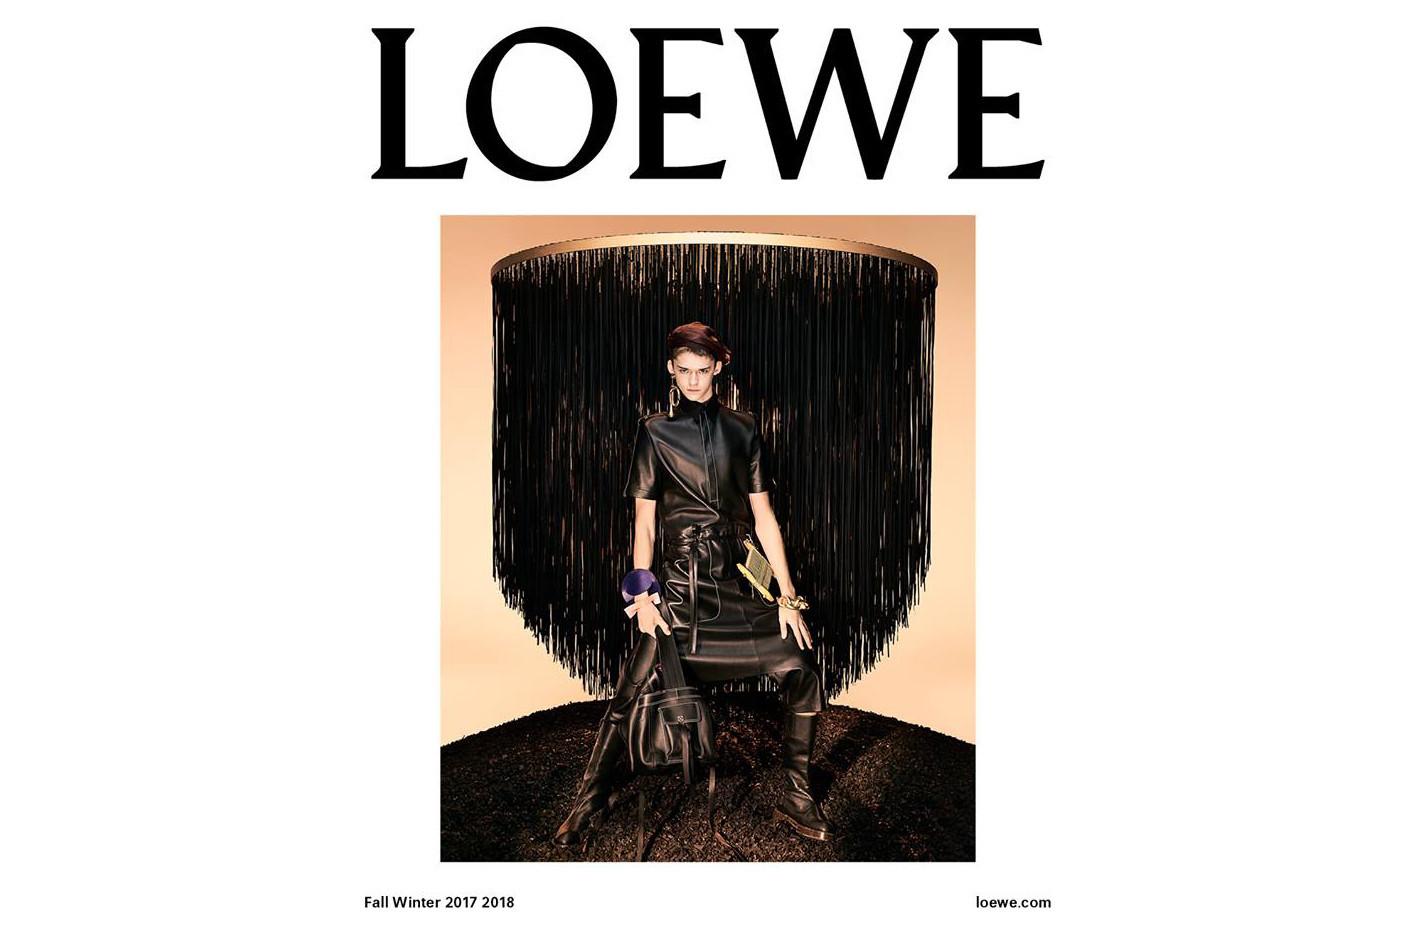 Loewe FW17 campaign